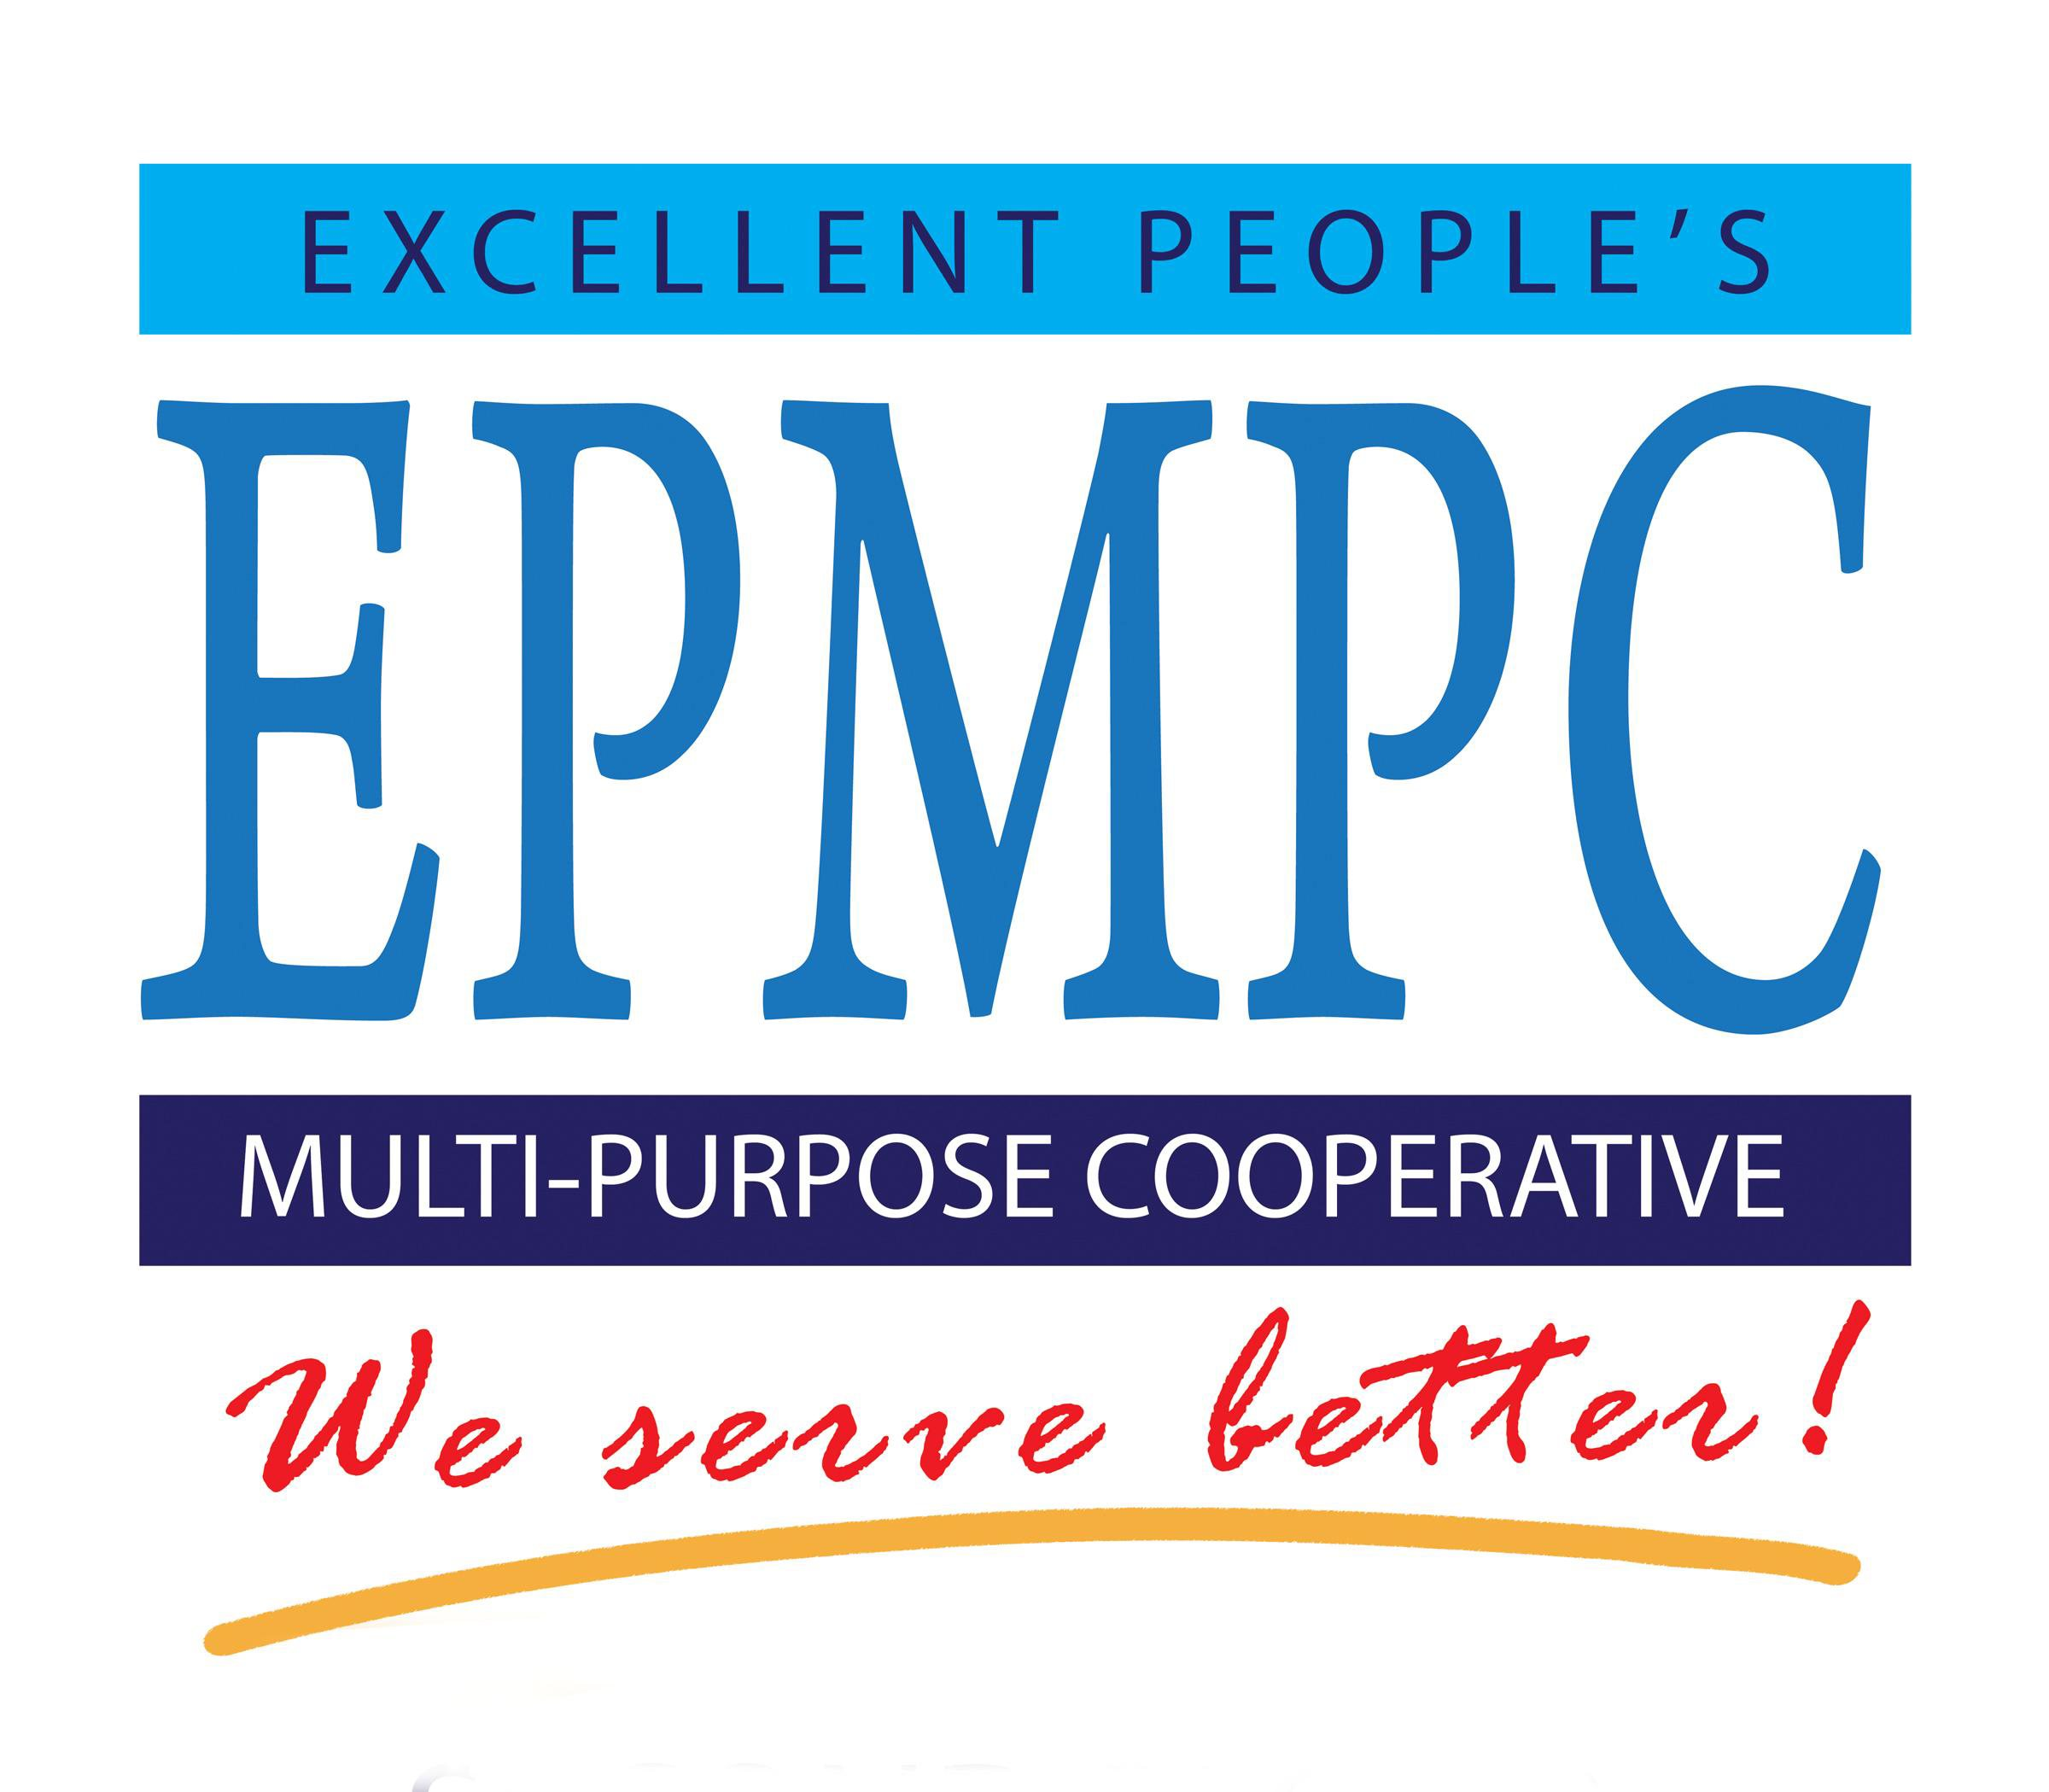 EXCELLENT PEOPLES MULTIPURPOSE COOPERATIVE